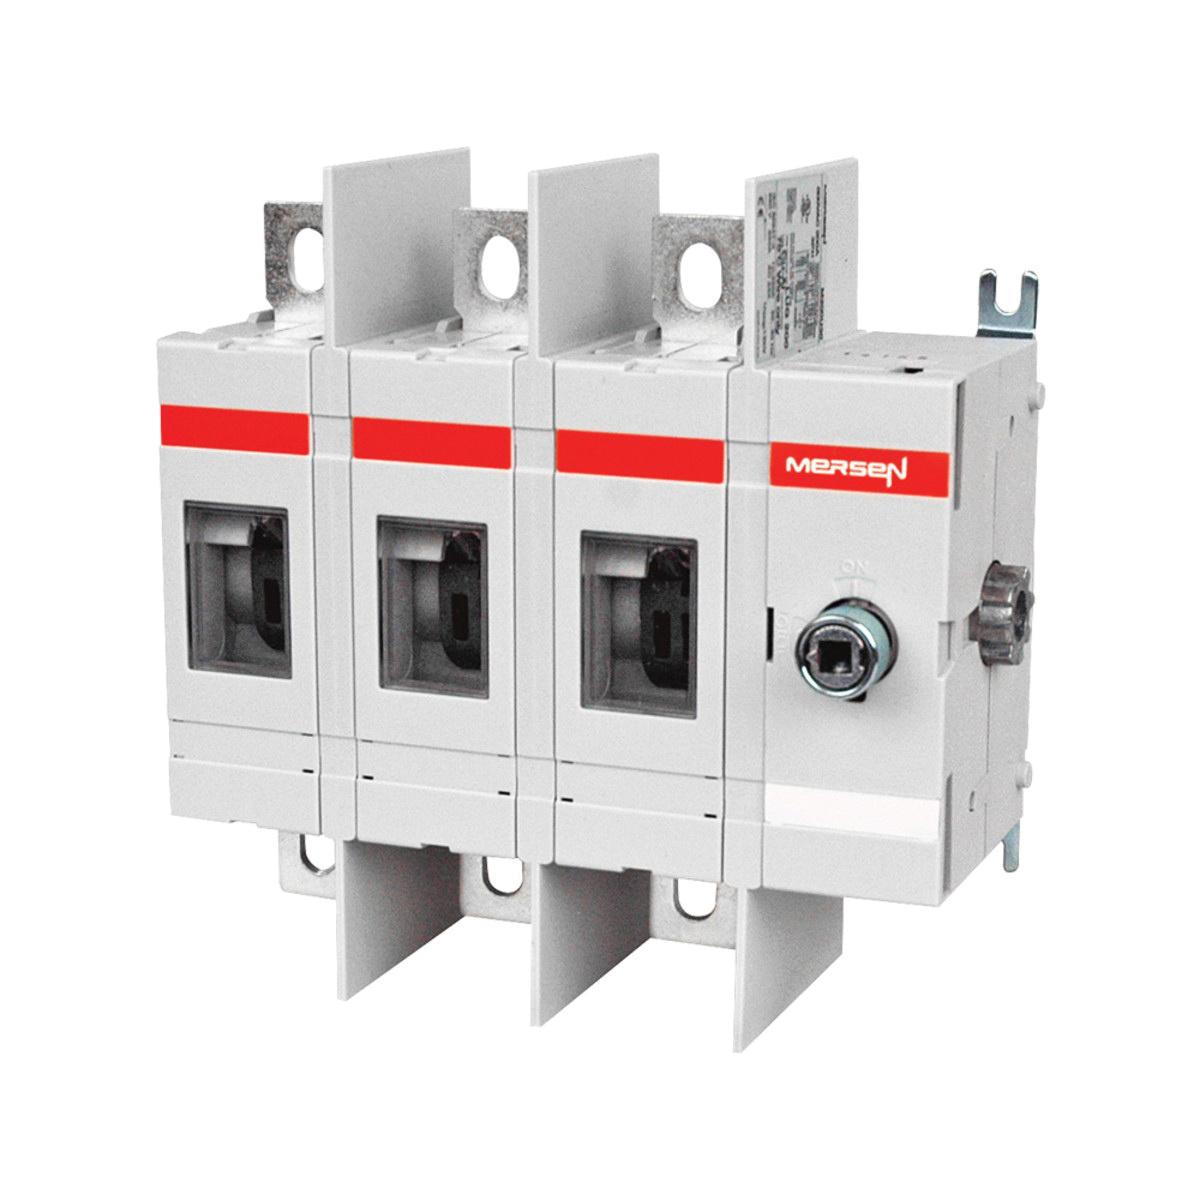 Mersen M200U30 3-Pole 3-Phase Non-Fusible Disconnect Switch 600 Volt ...